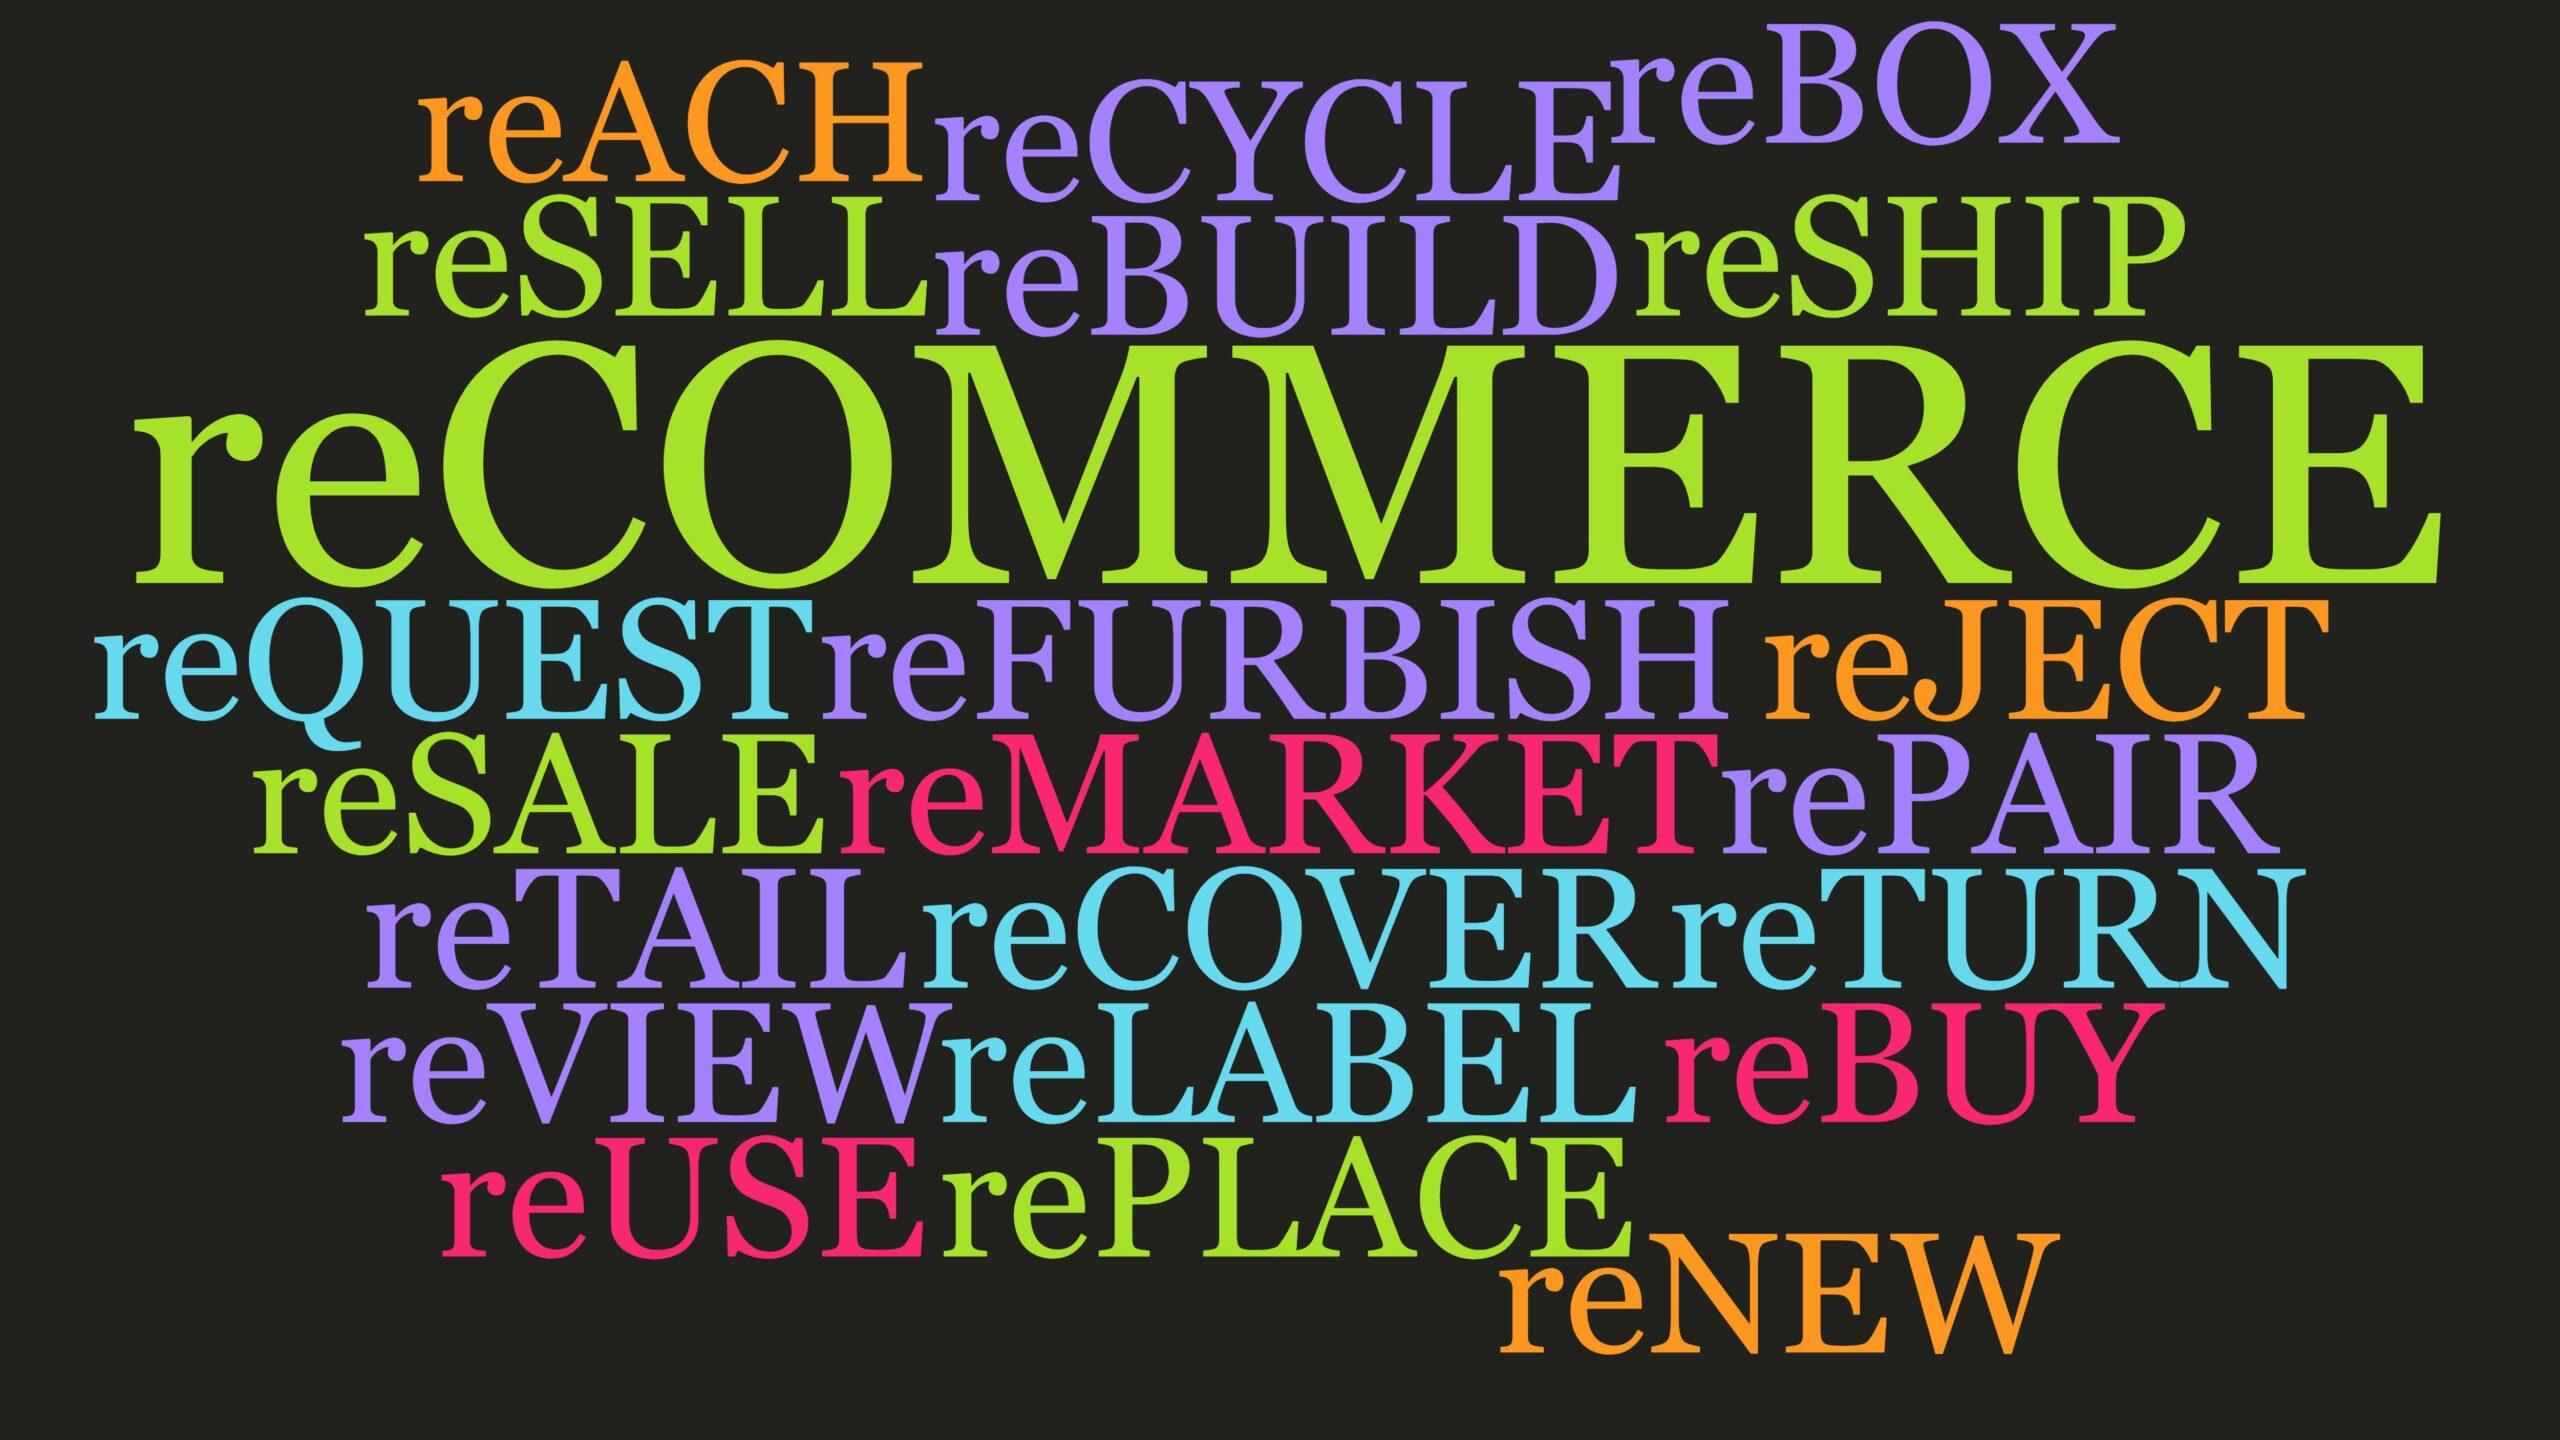 Recommerce eCommerce